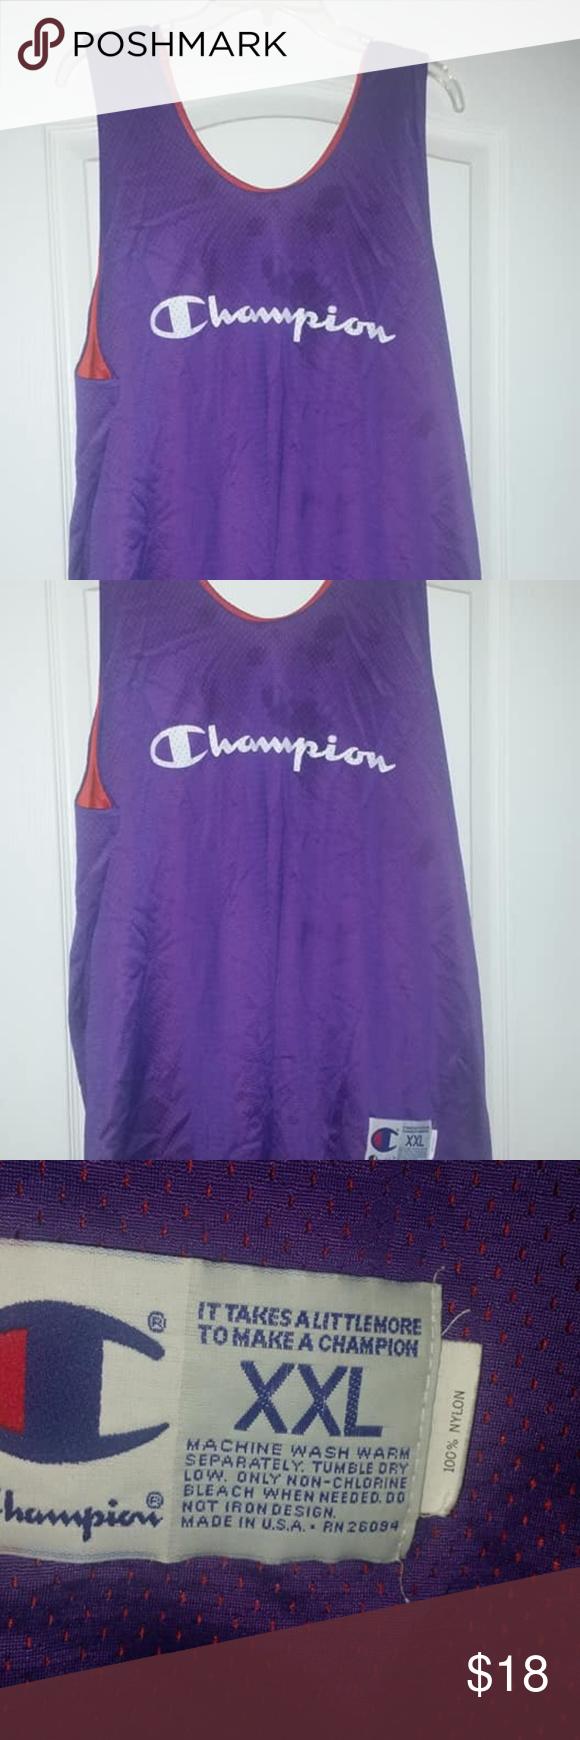 Reversible Champion Jersey Lightly worn basketball jersey